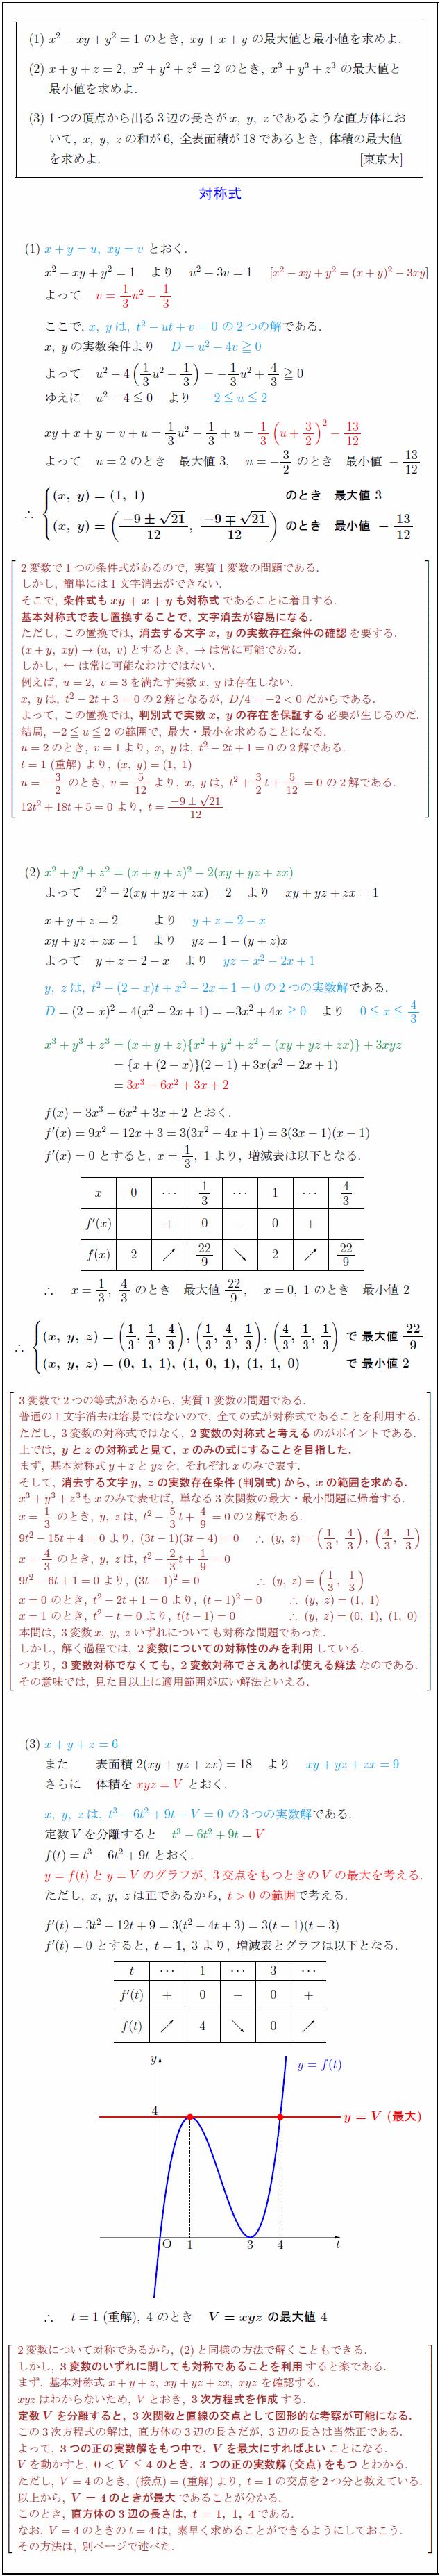 symmetrical-expression